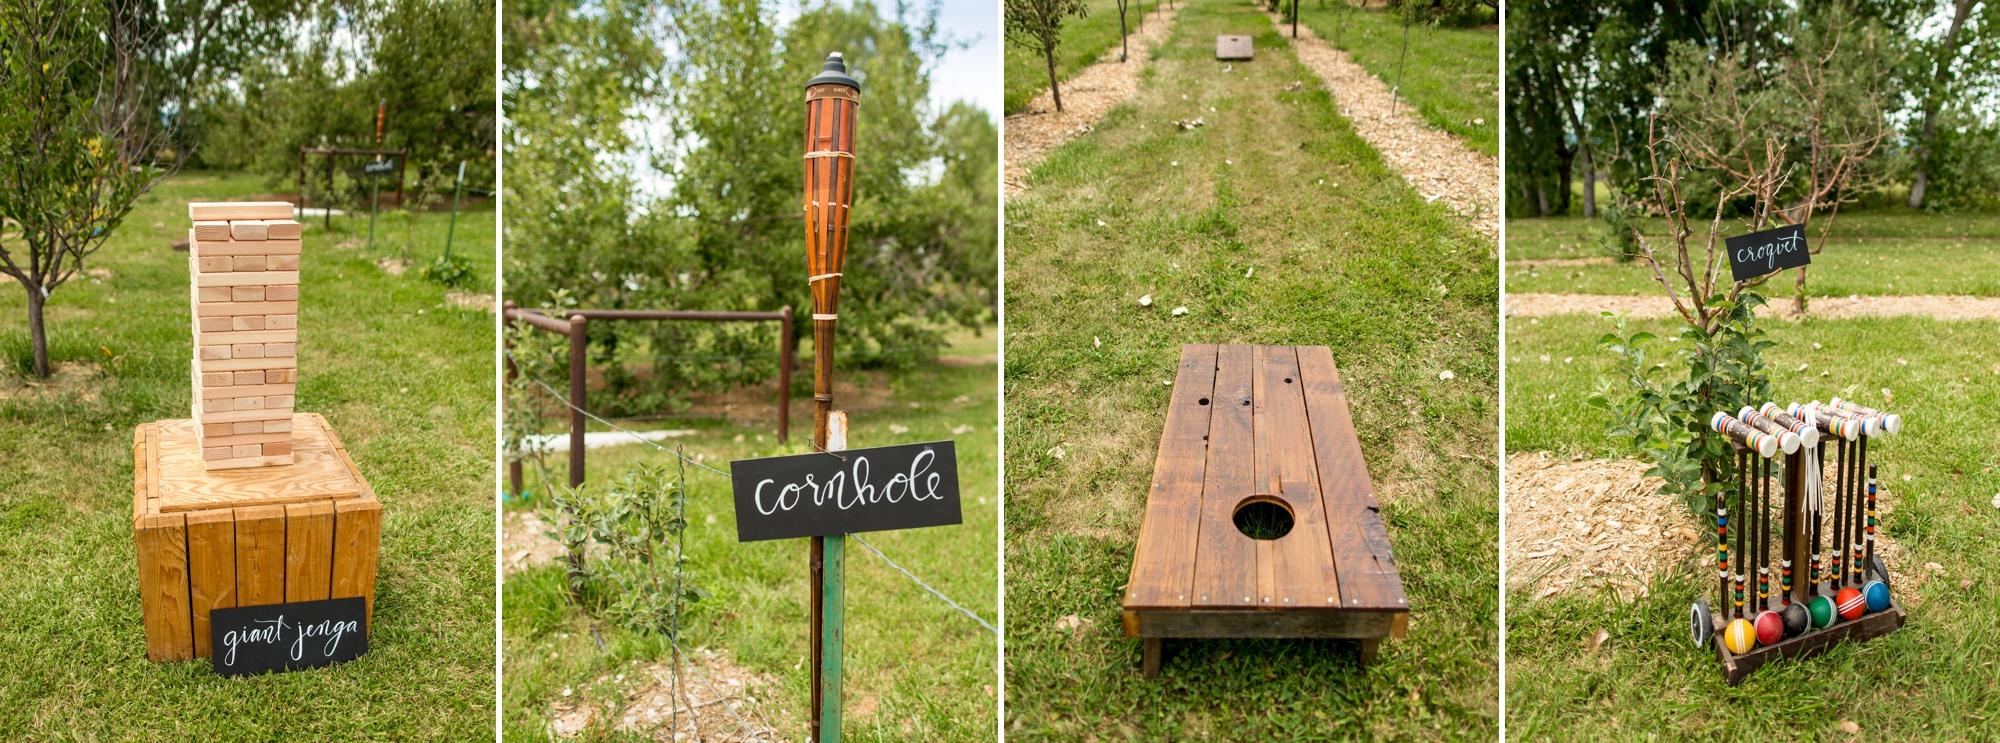 Giant jenga, cornhole, croquet are a must for farm wedding festivities!